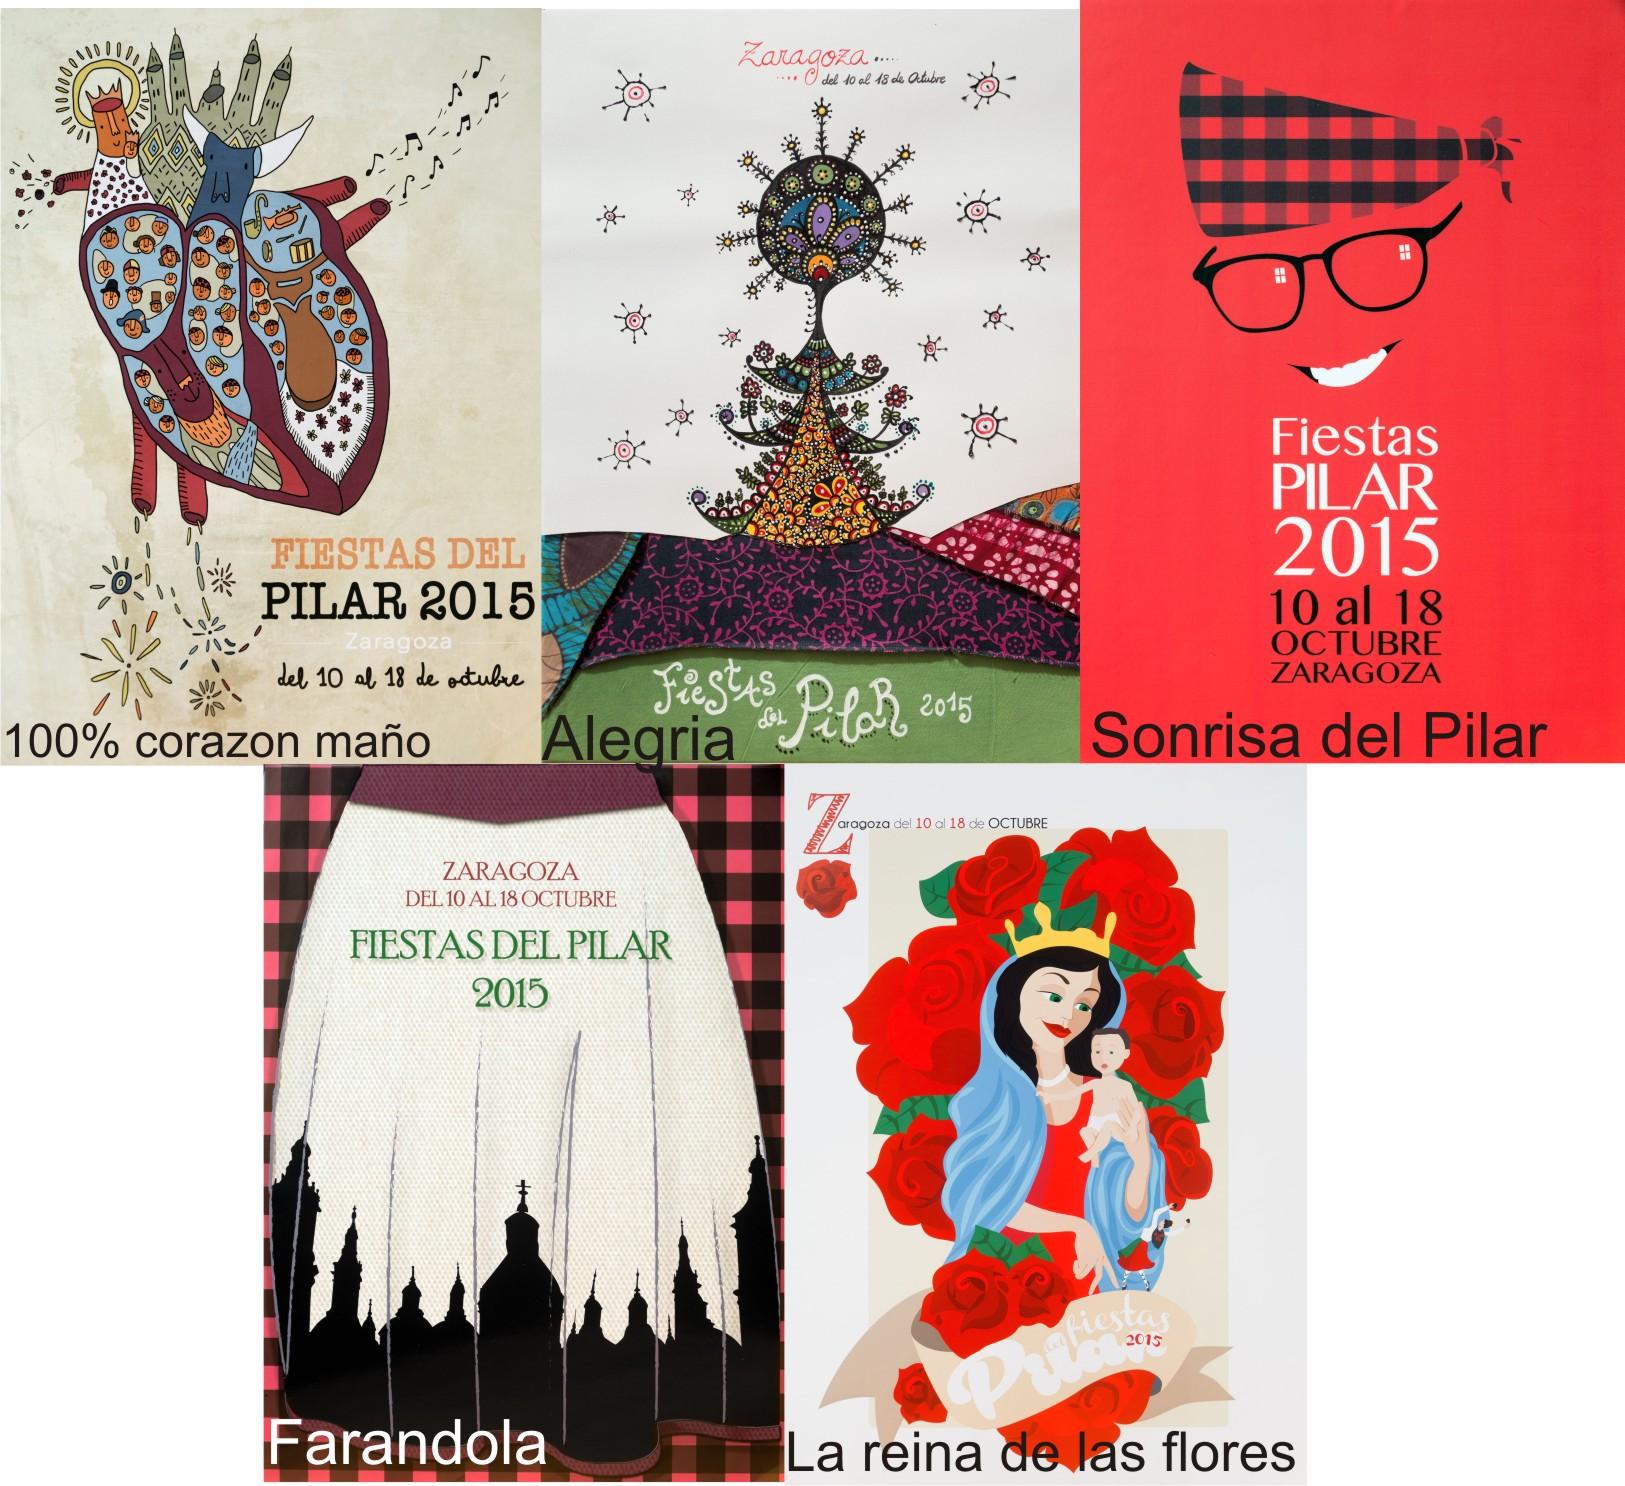 20150515083656-pilar-2015-finalistas-titulos-peq.jpg